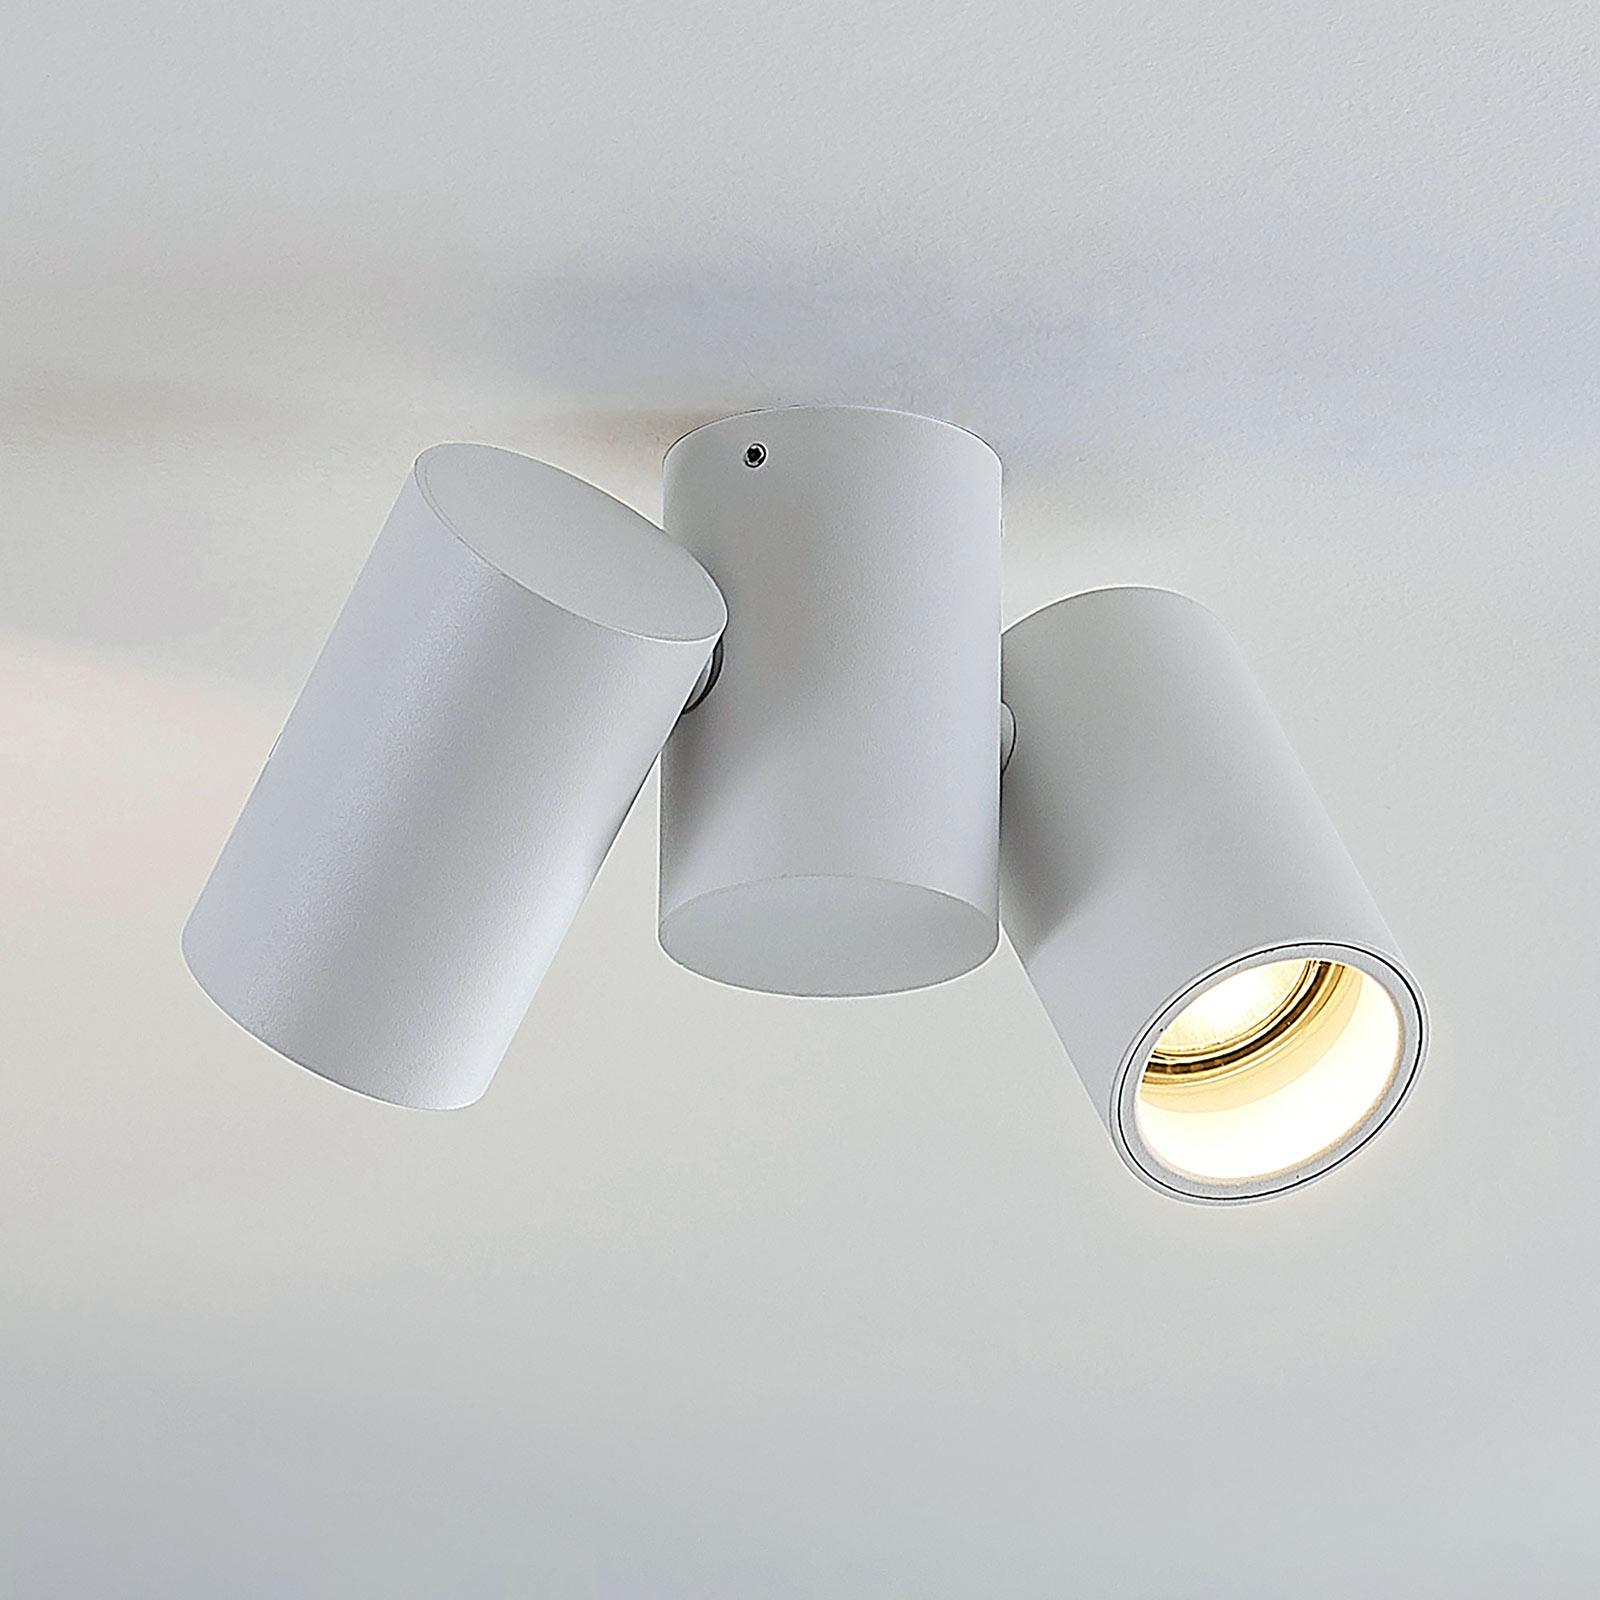 Taklampa Gesigna, 2 lampor, vit